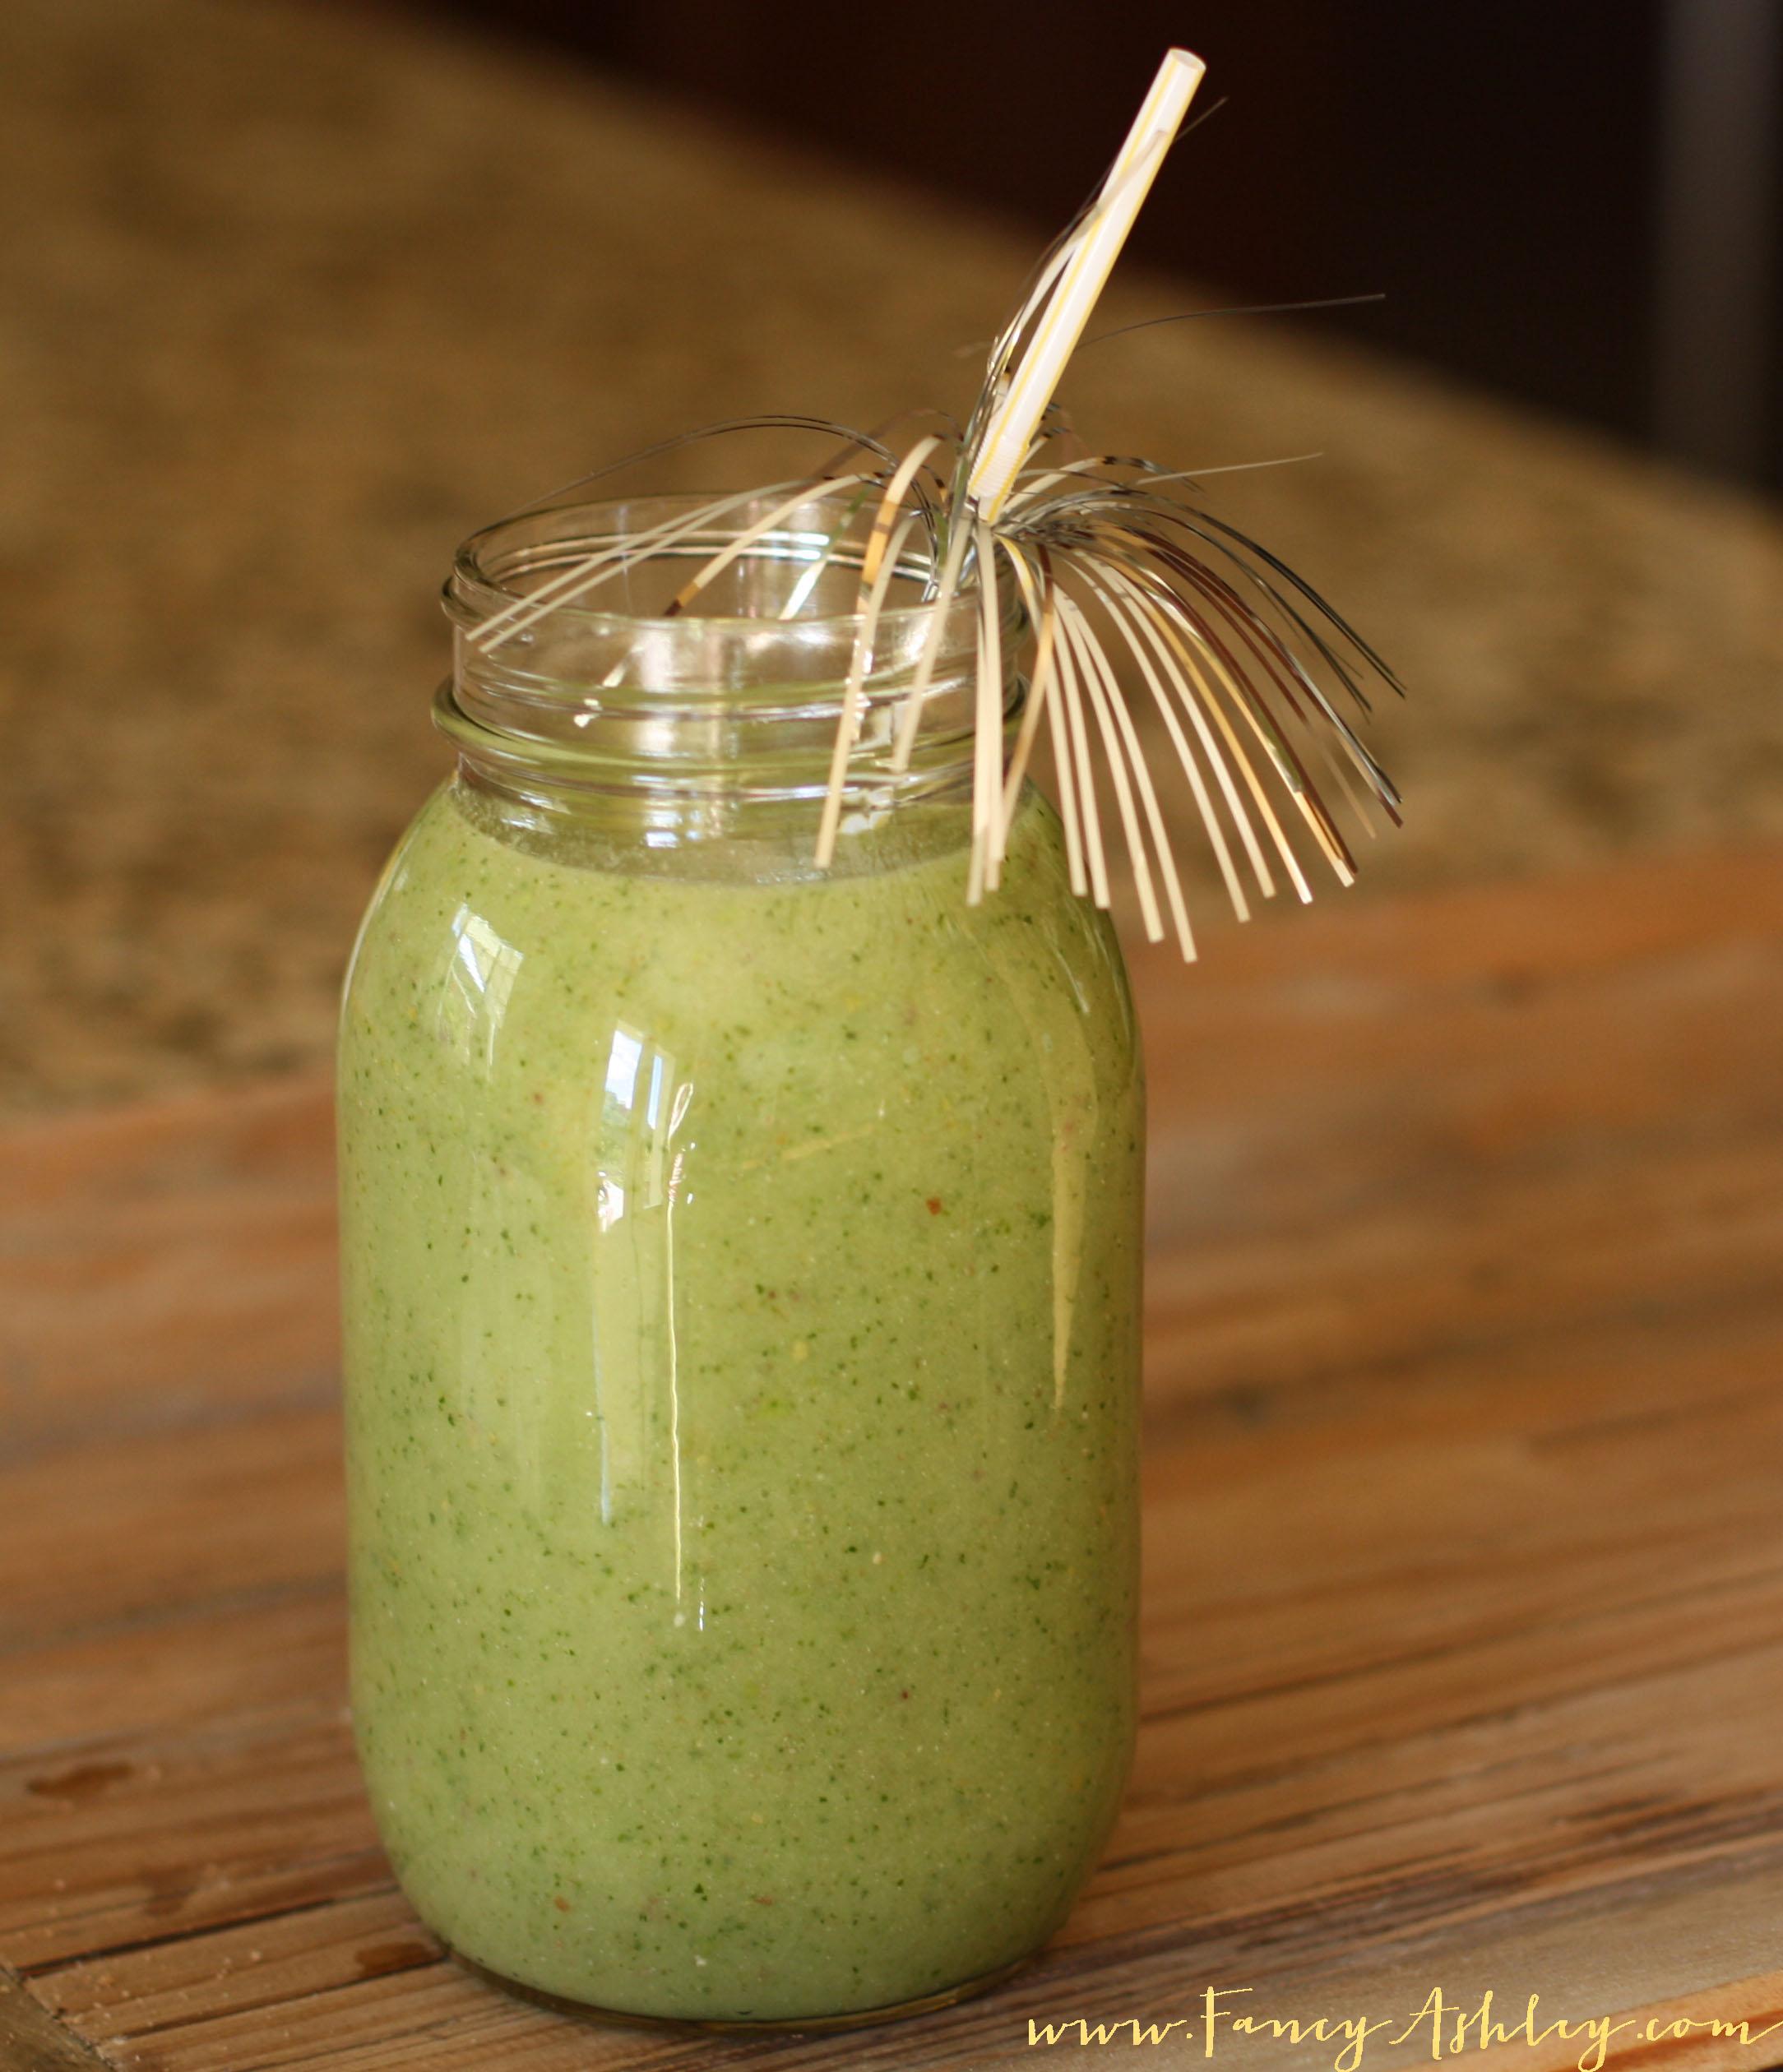 Fancy Green Smoothie Recipe // Fancy Ashley